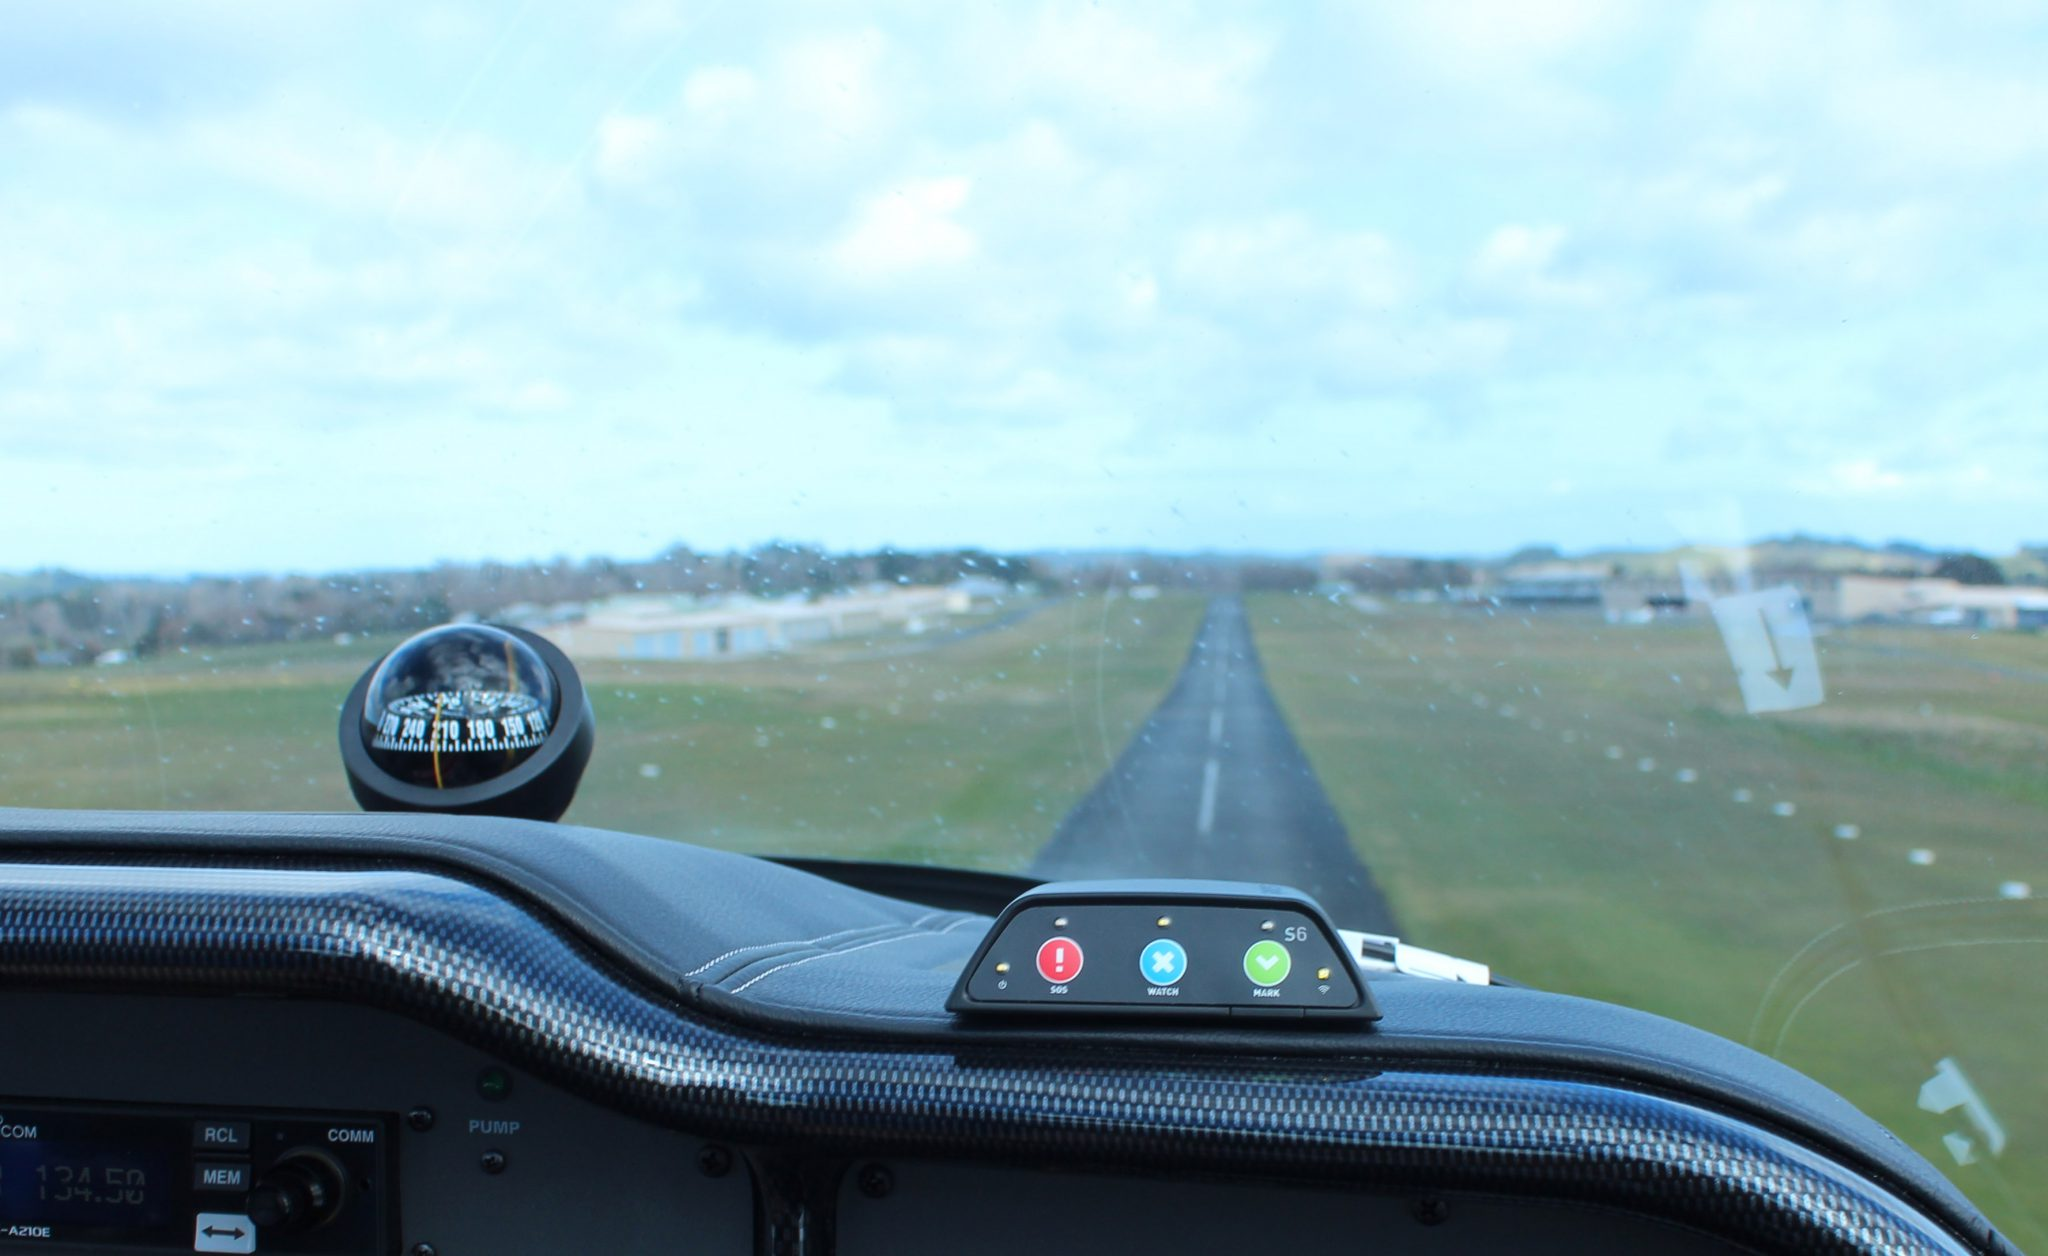 Spidertracks Hosts Free Aviation Safety Workshop In Kenya